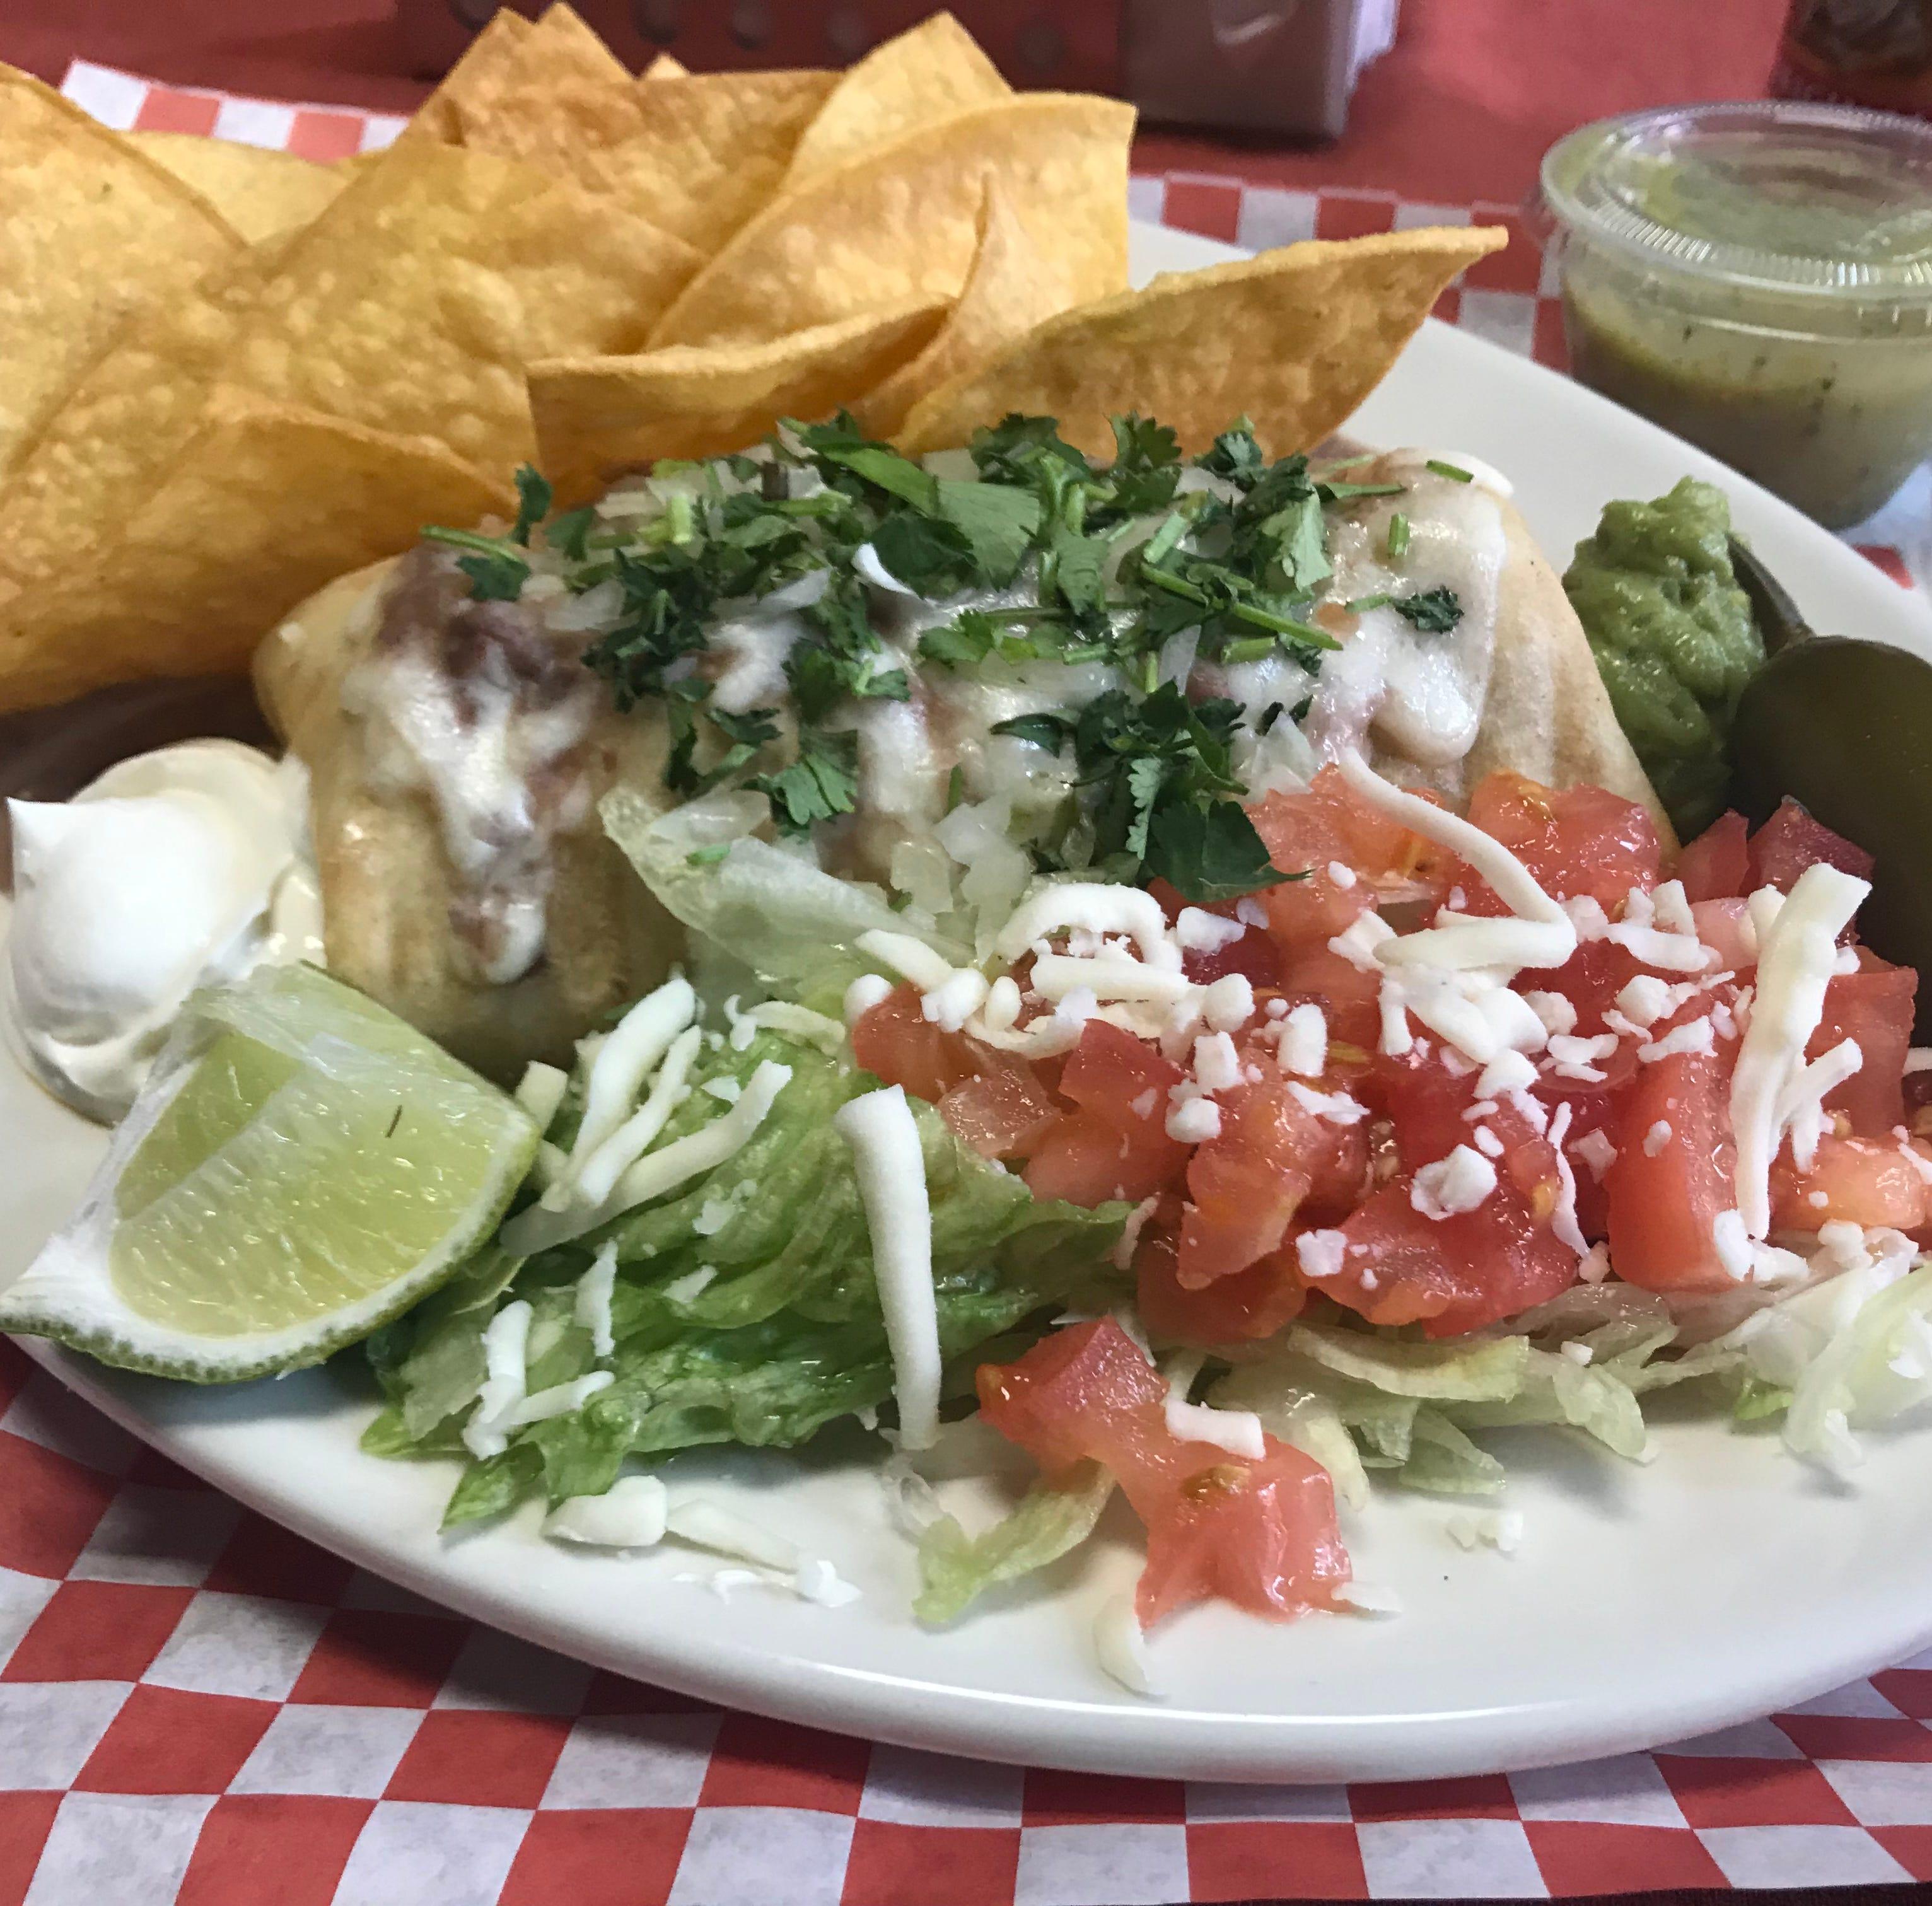 Puerto Rico native opens Mexican restaurant in shuttered Irish pub